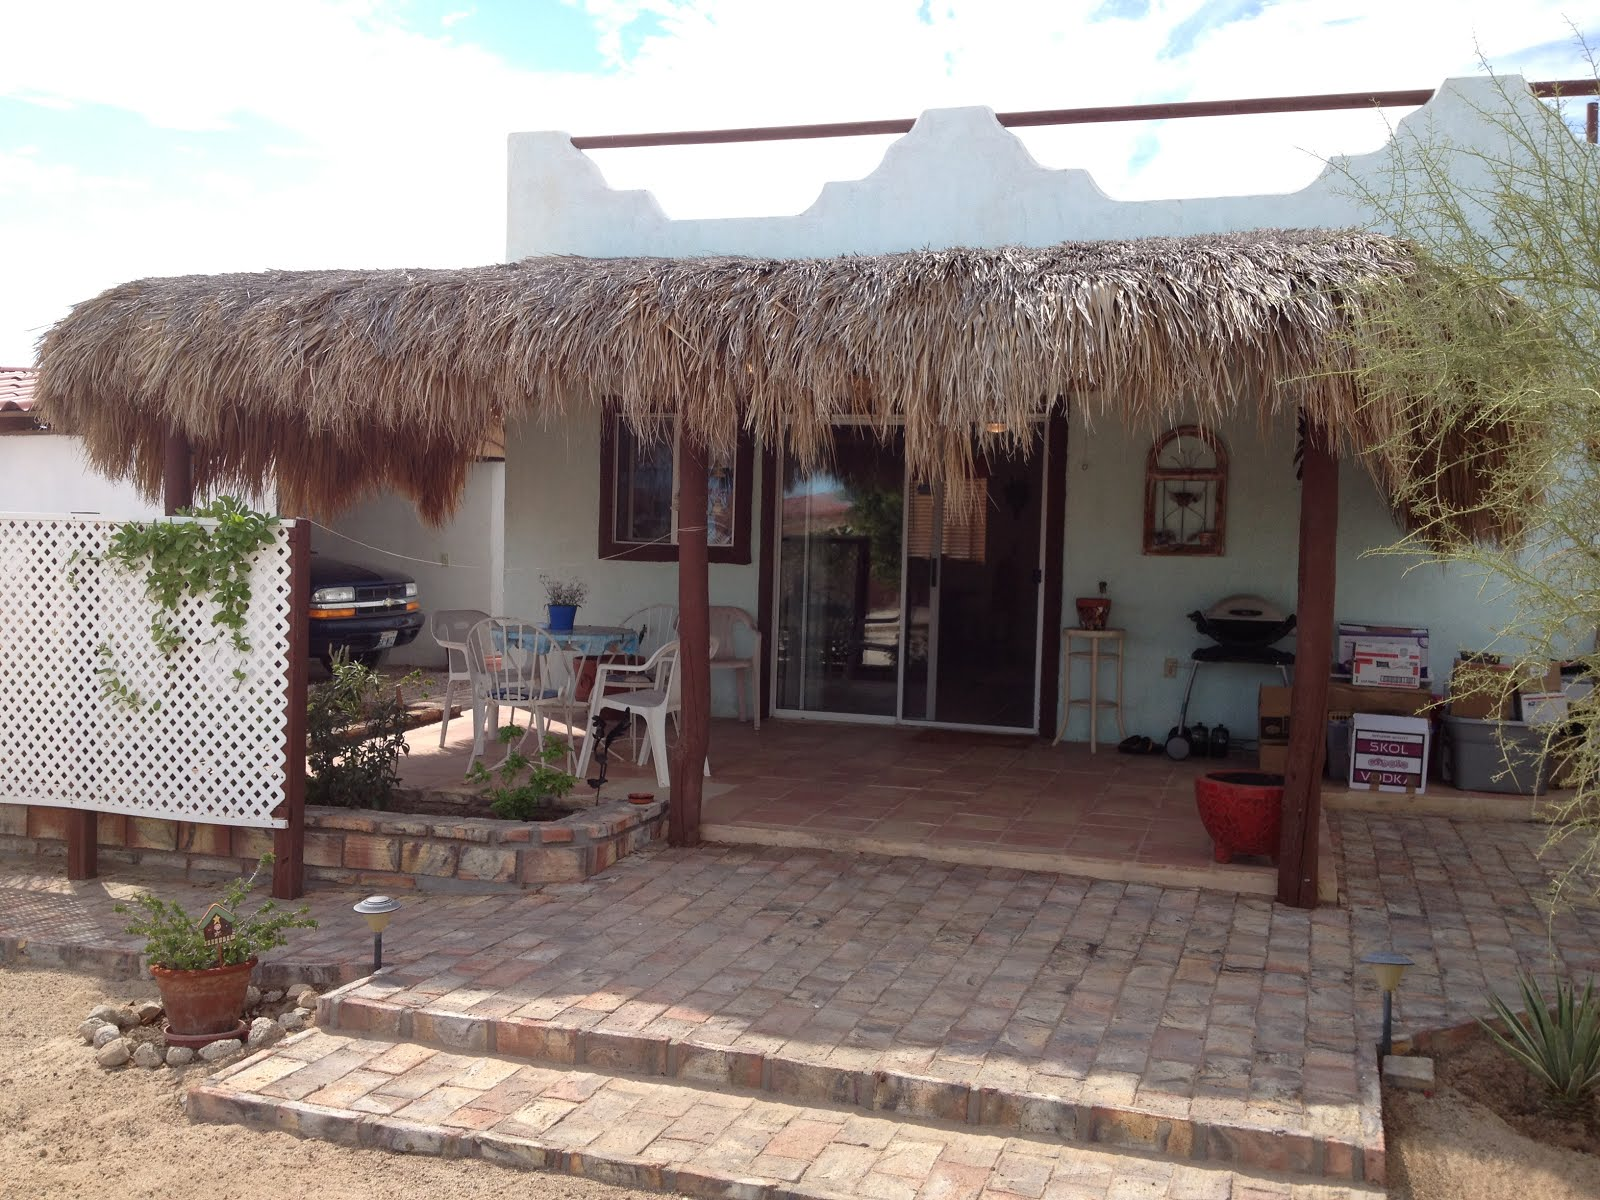 San felipe baja california mexico real estate updates for Nudura cost per square foot